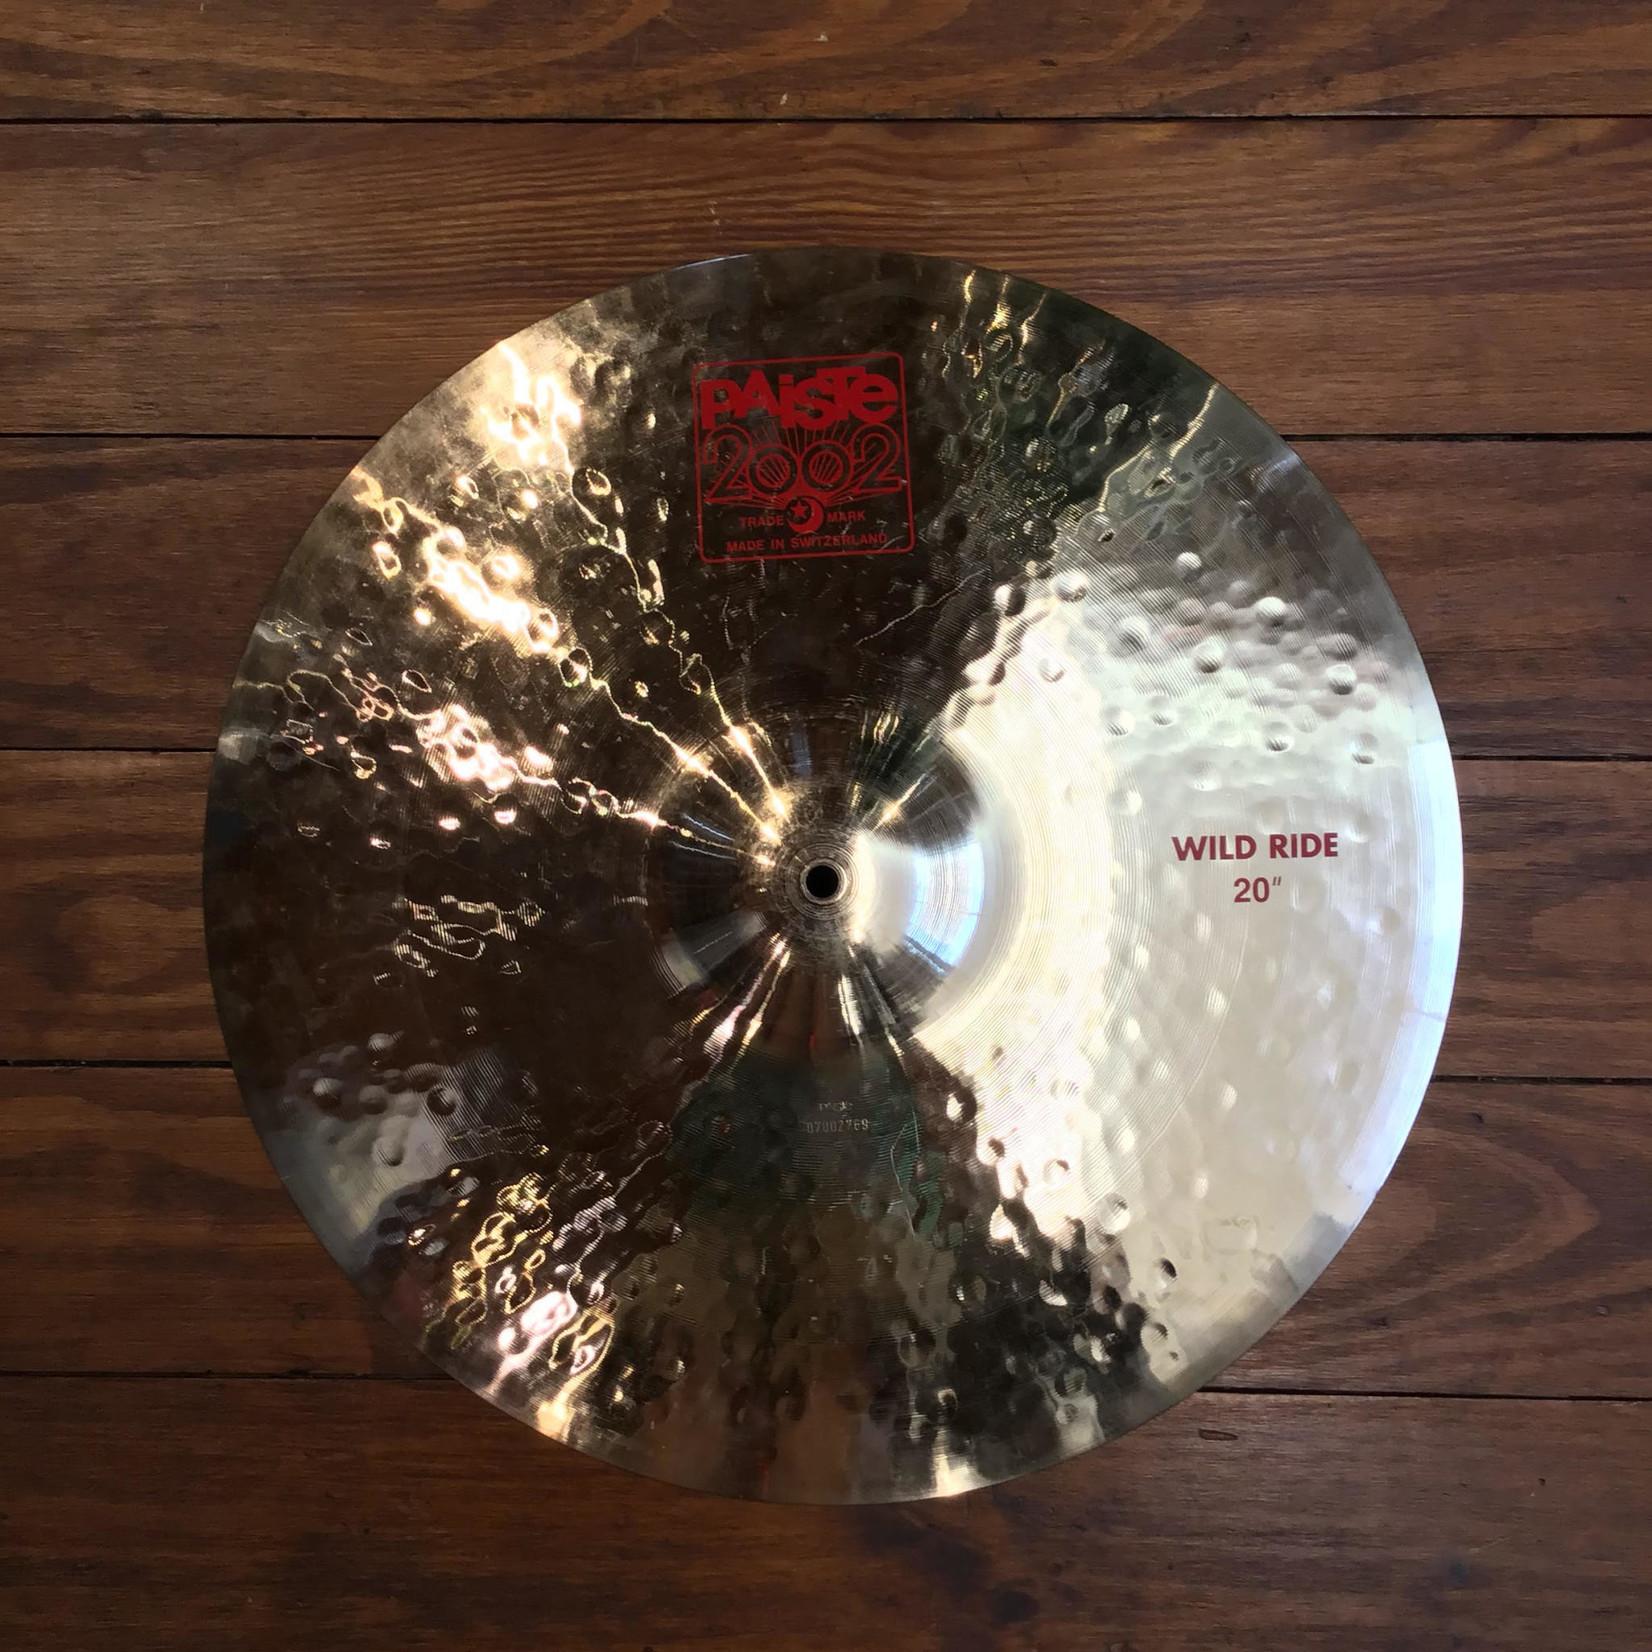 "Paiste USED Paiste 2002 20"" Wild Ride Cymbal (Discontinued)"